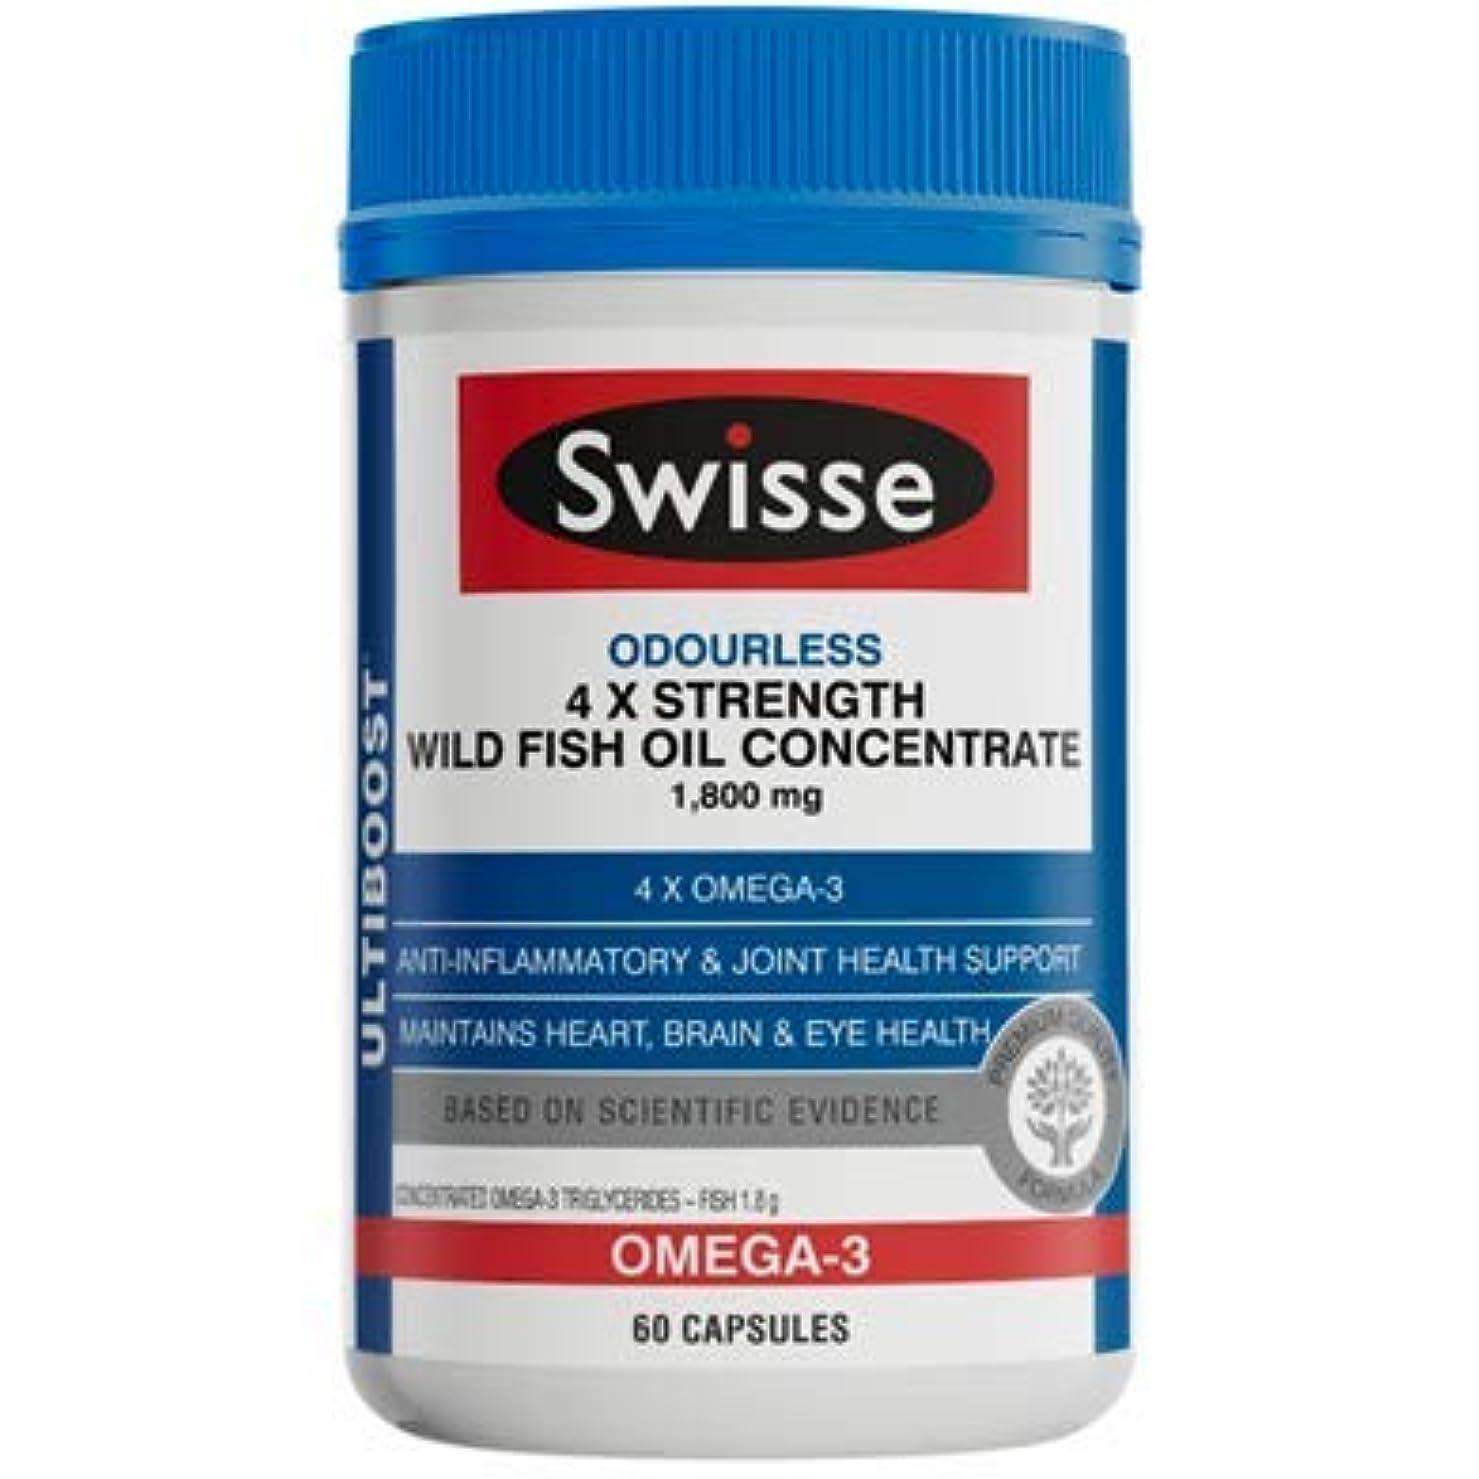 Swisse 無臭ワイルド フィッシュオイル コンセントレート60カプセル [海外直送品] [並行輸入品]